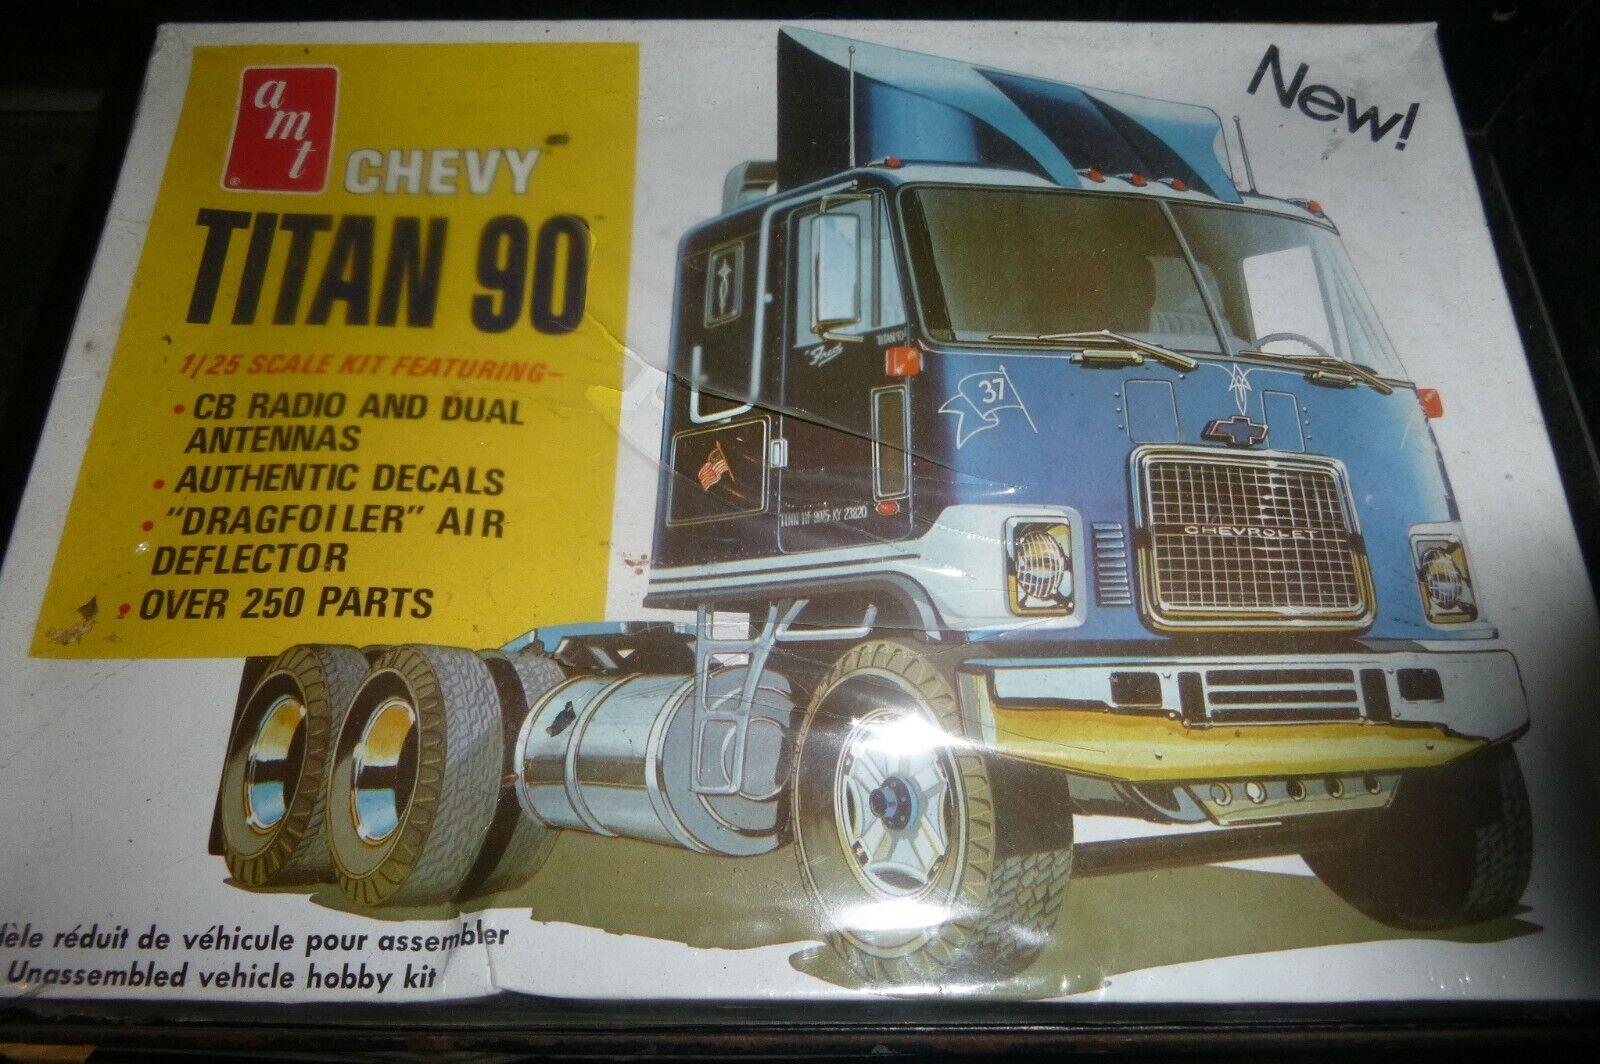 Amt 603 Chevy Titan 90 Modeljahren Truck 1 25 Modelauto Mountain FS